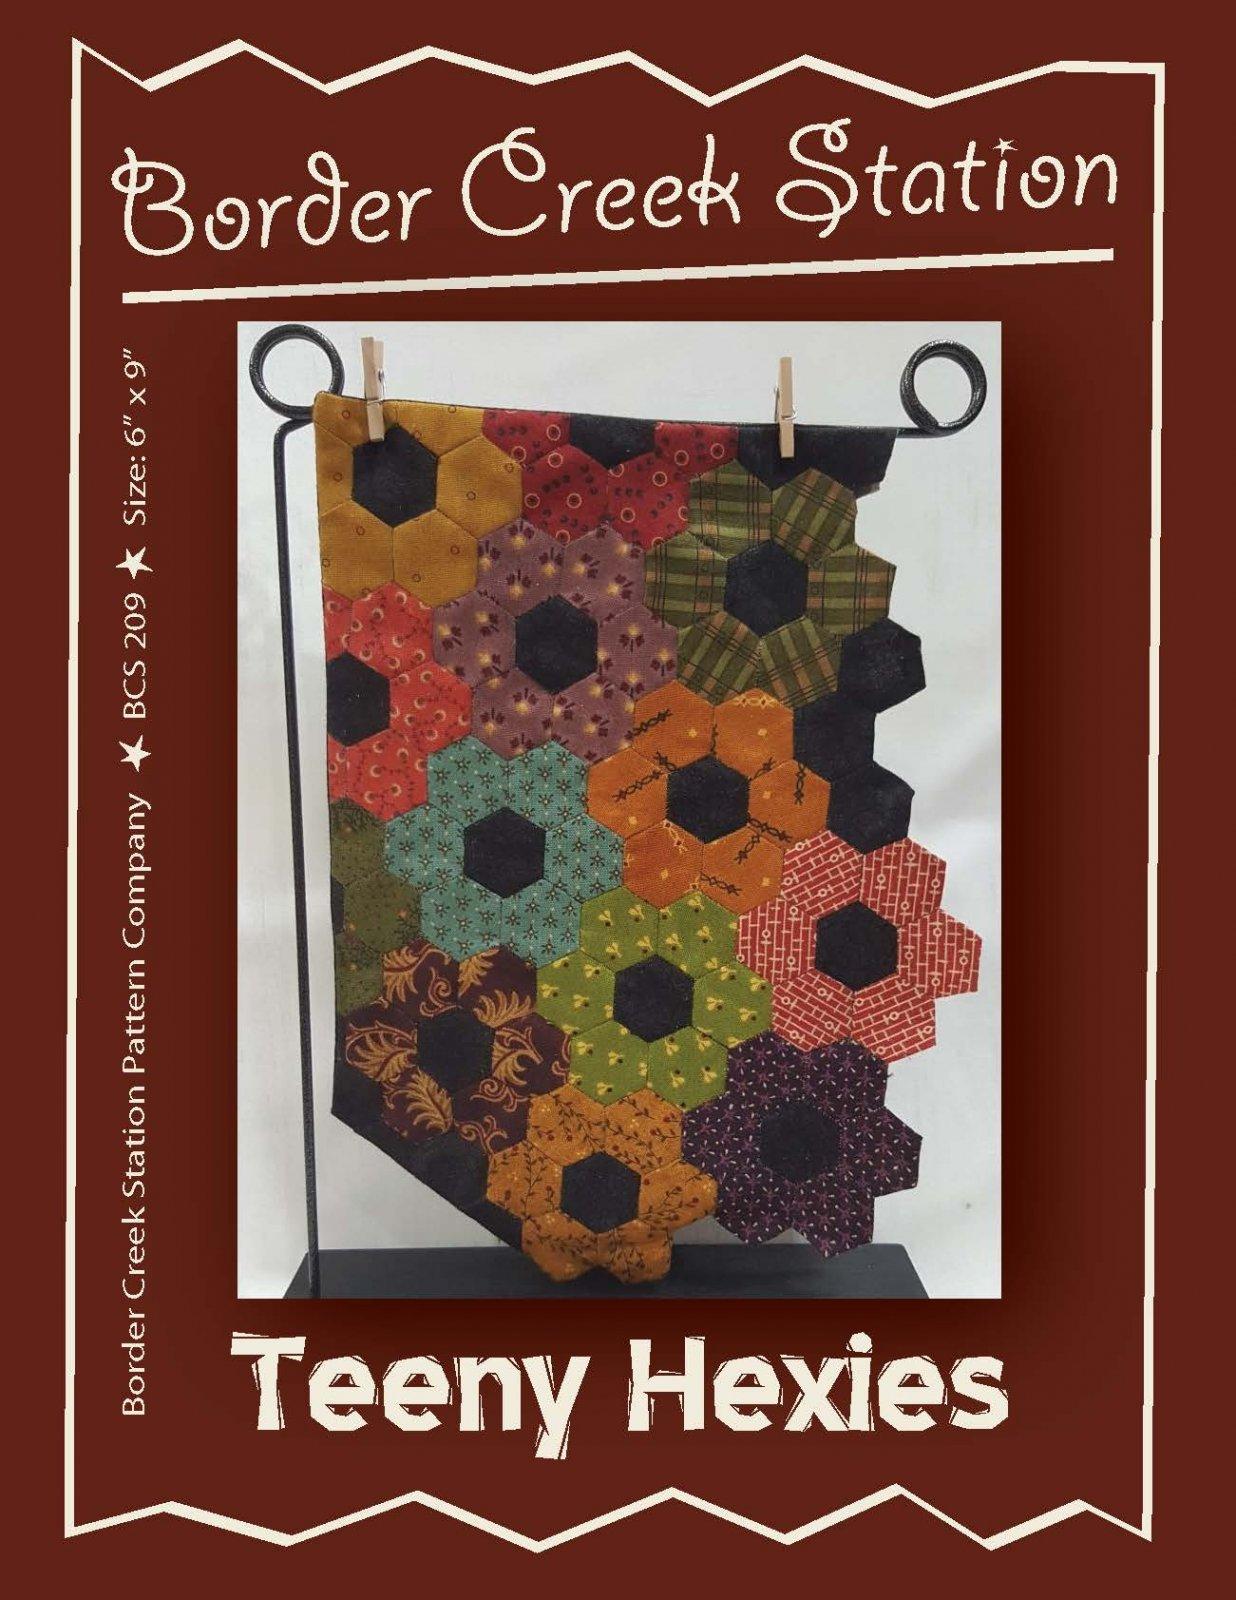 Teeny Hexies